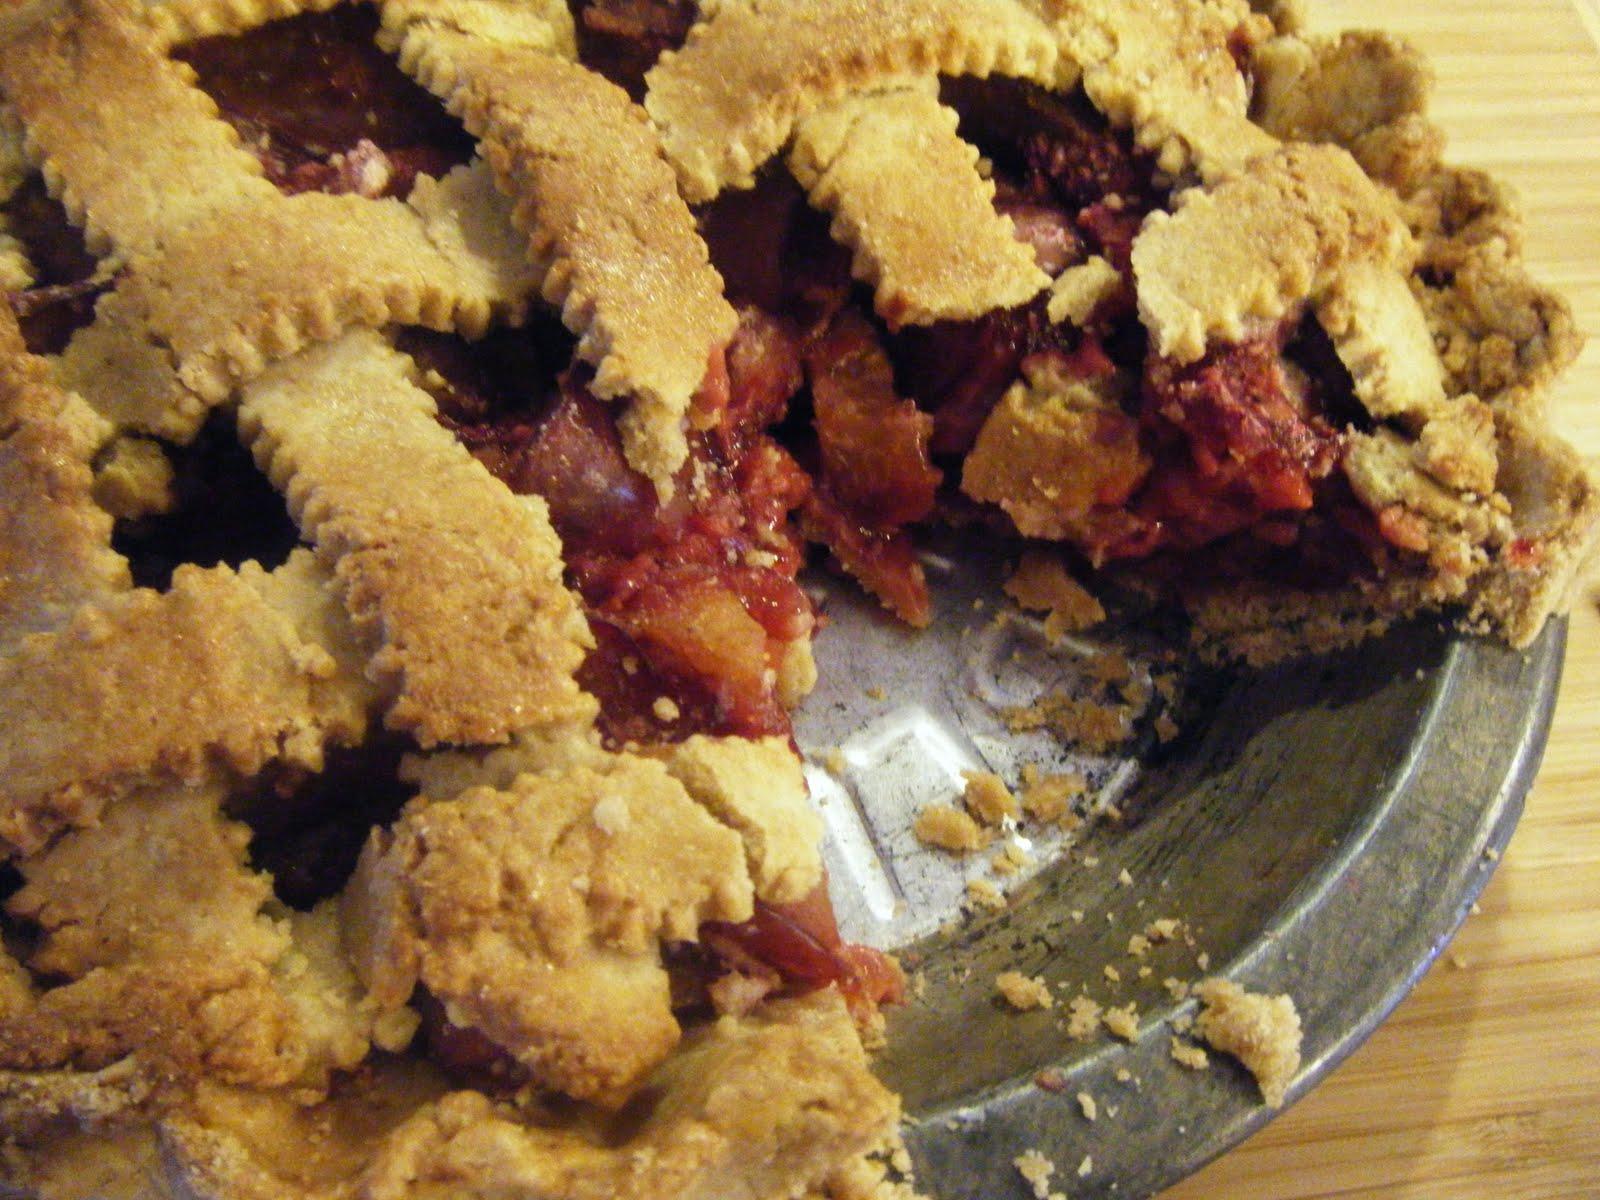 west side baker: Plum Raspberry Pie With A Sweet Almond Lattice